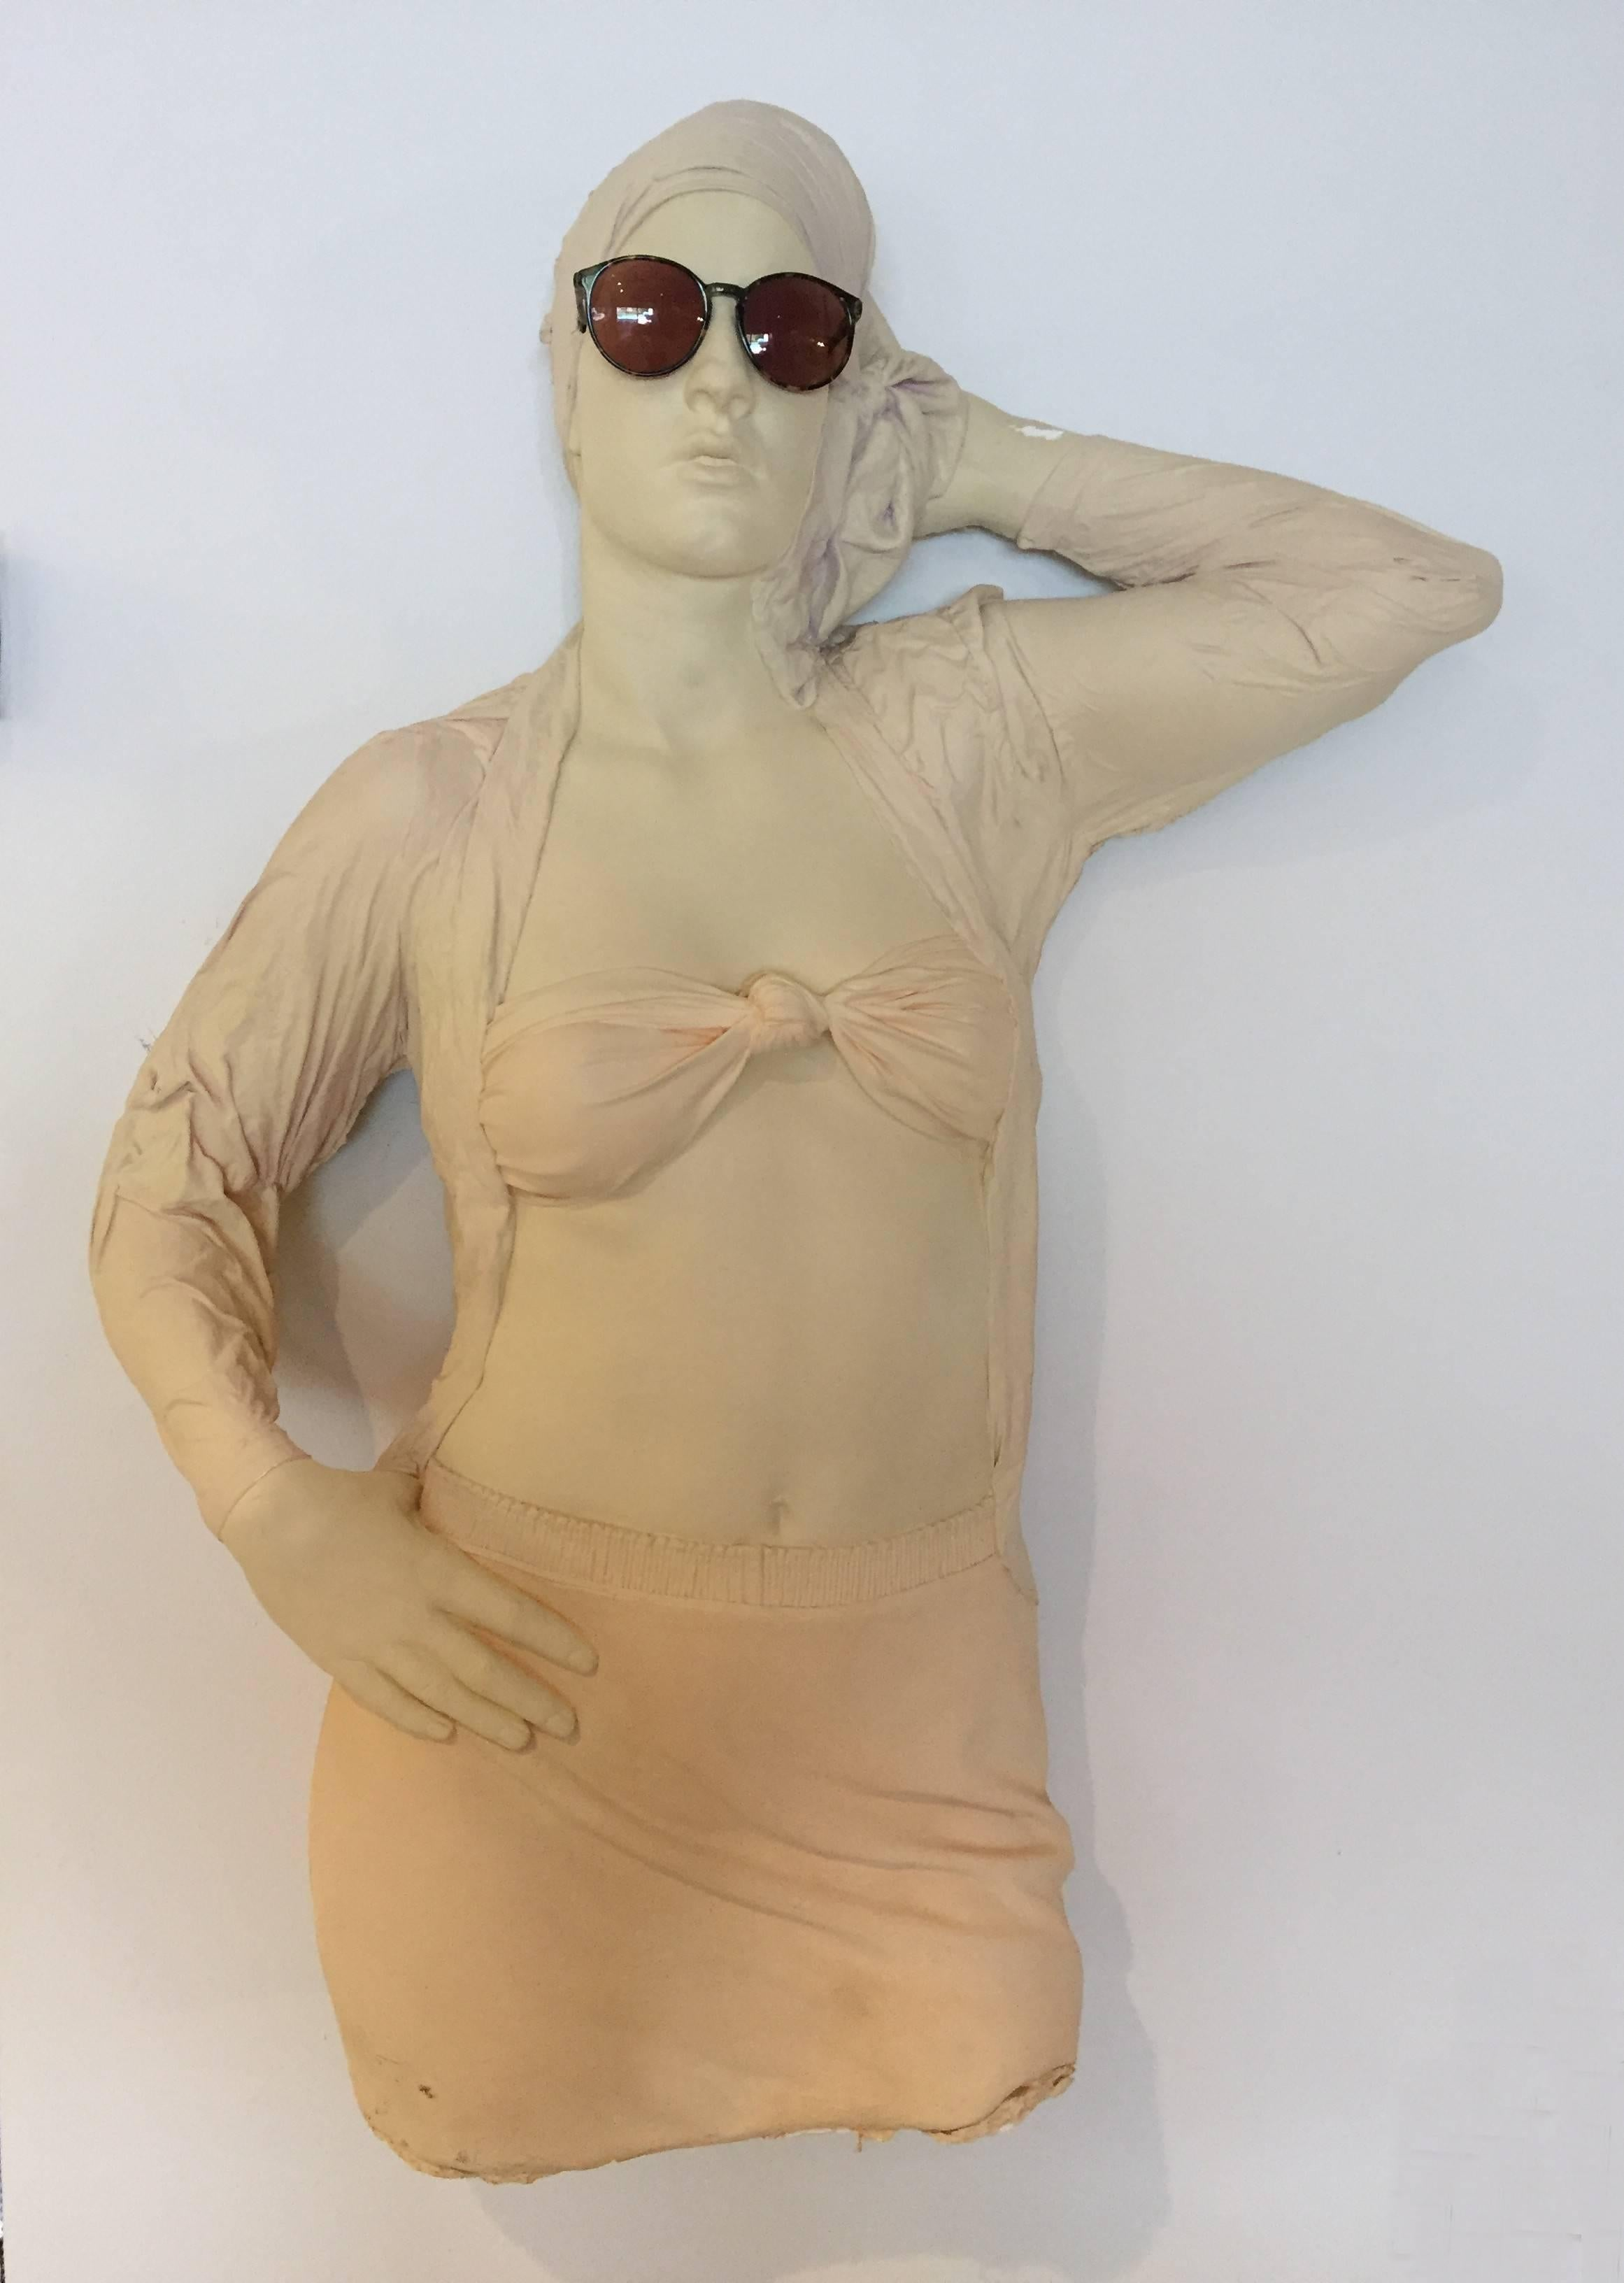 Girl with Glasses Mark Sijan lifelike ceramic sculpture